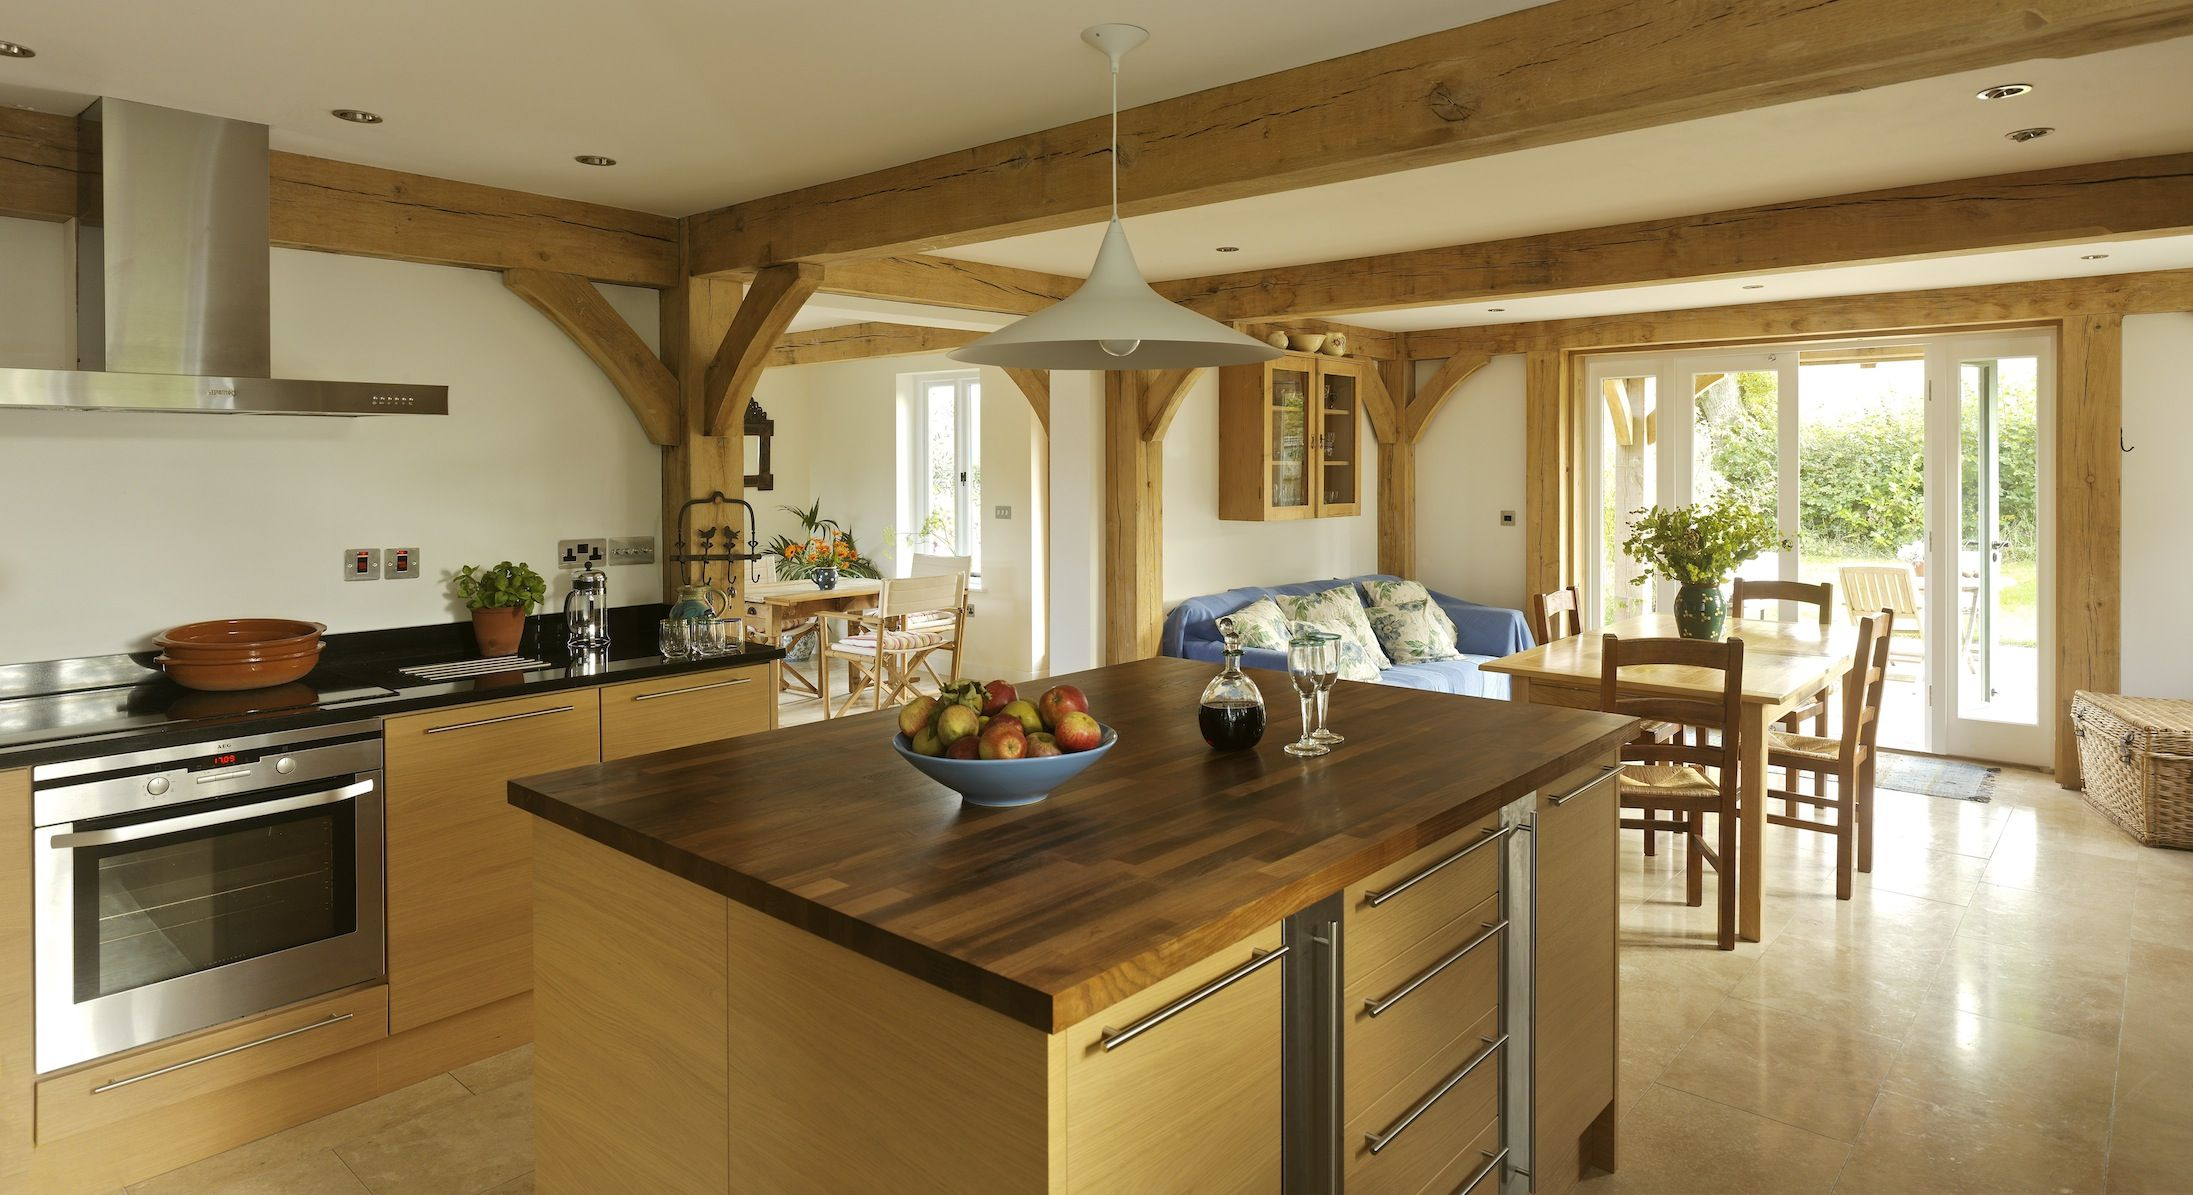 Border Oak Kitchen Framing Country Kitchen Diner Kitchen Design Decor Country Style Kitchen